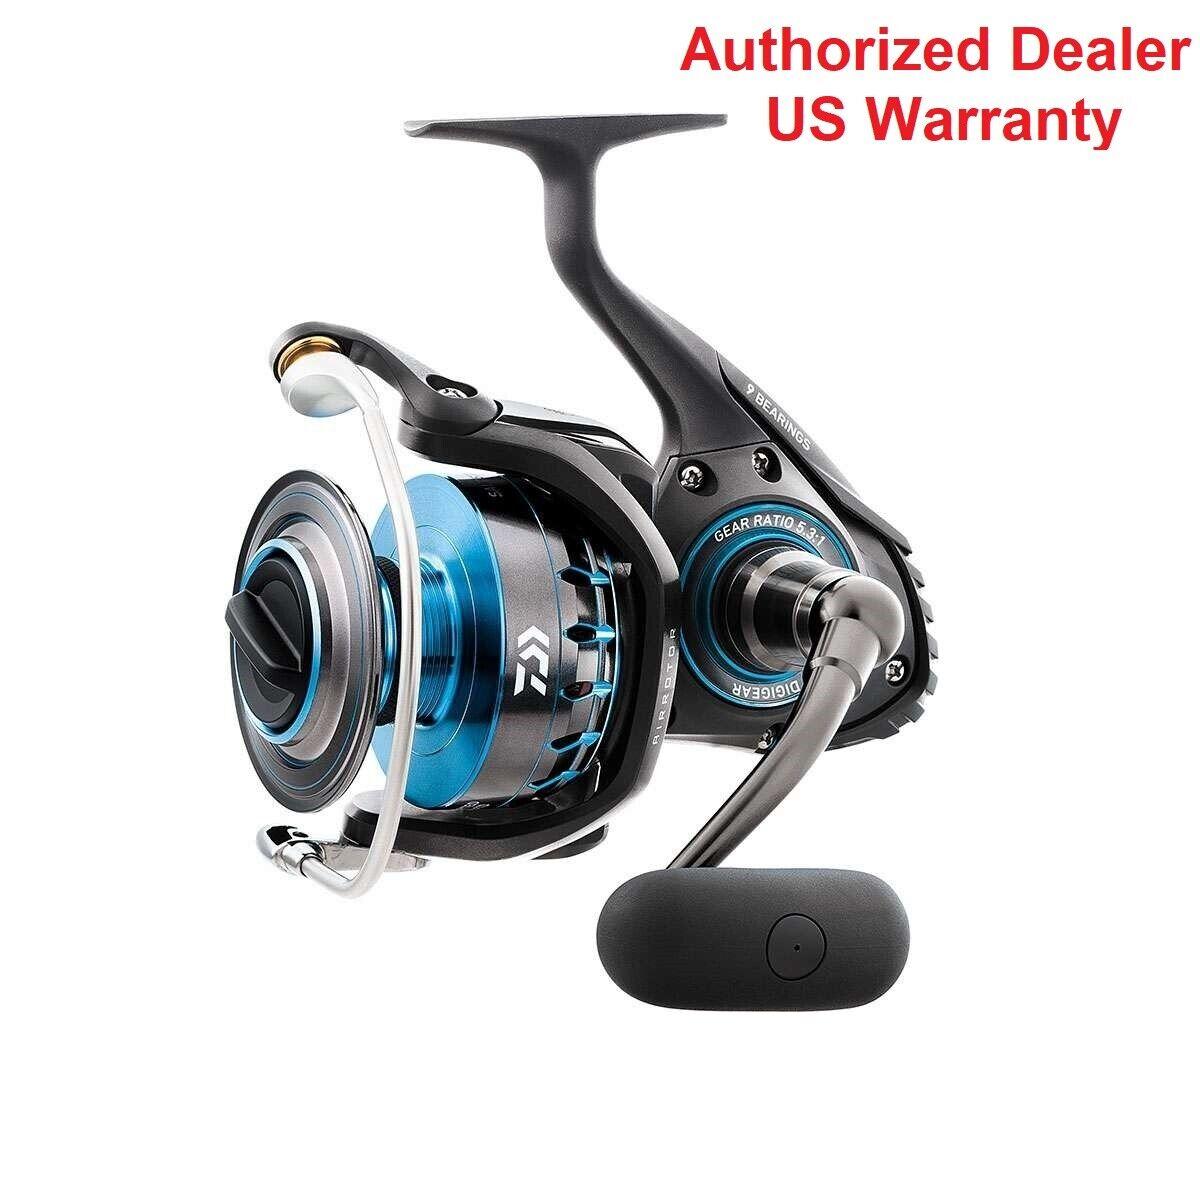 Brand New Daiwa Saltist 4500 5.7 1 Saltwater Spinning Fishing Reel SALTIST4500